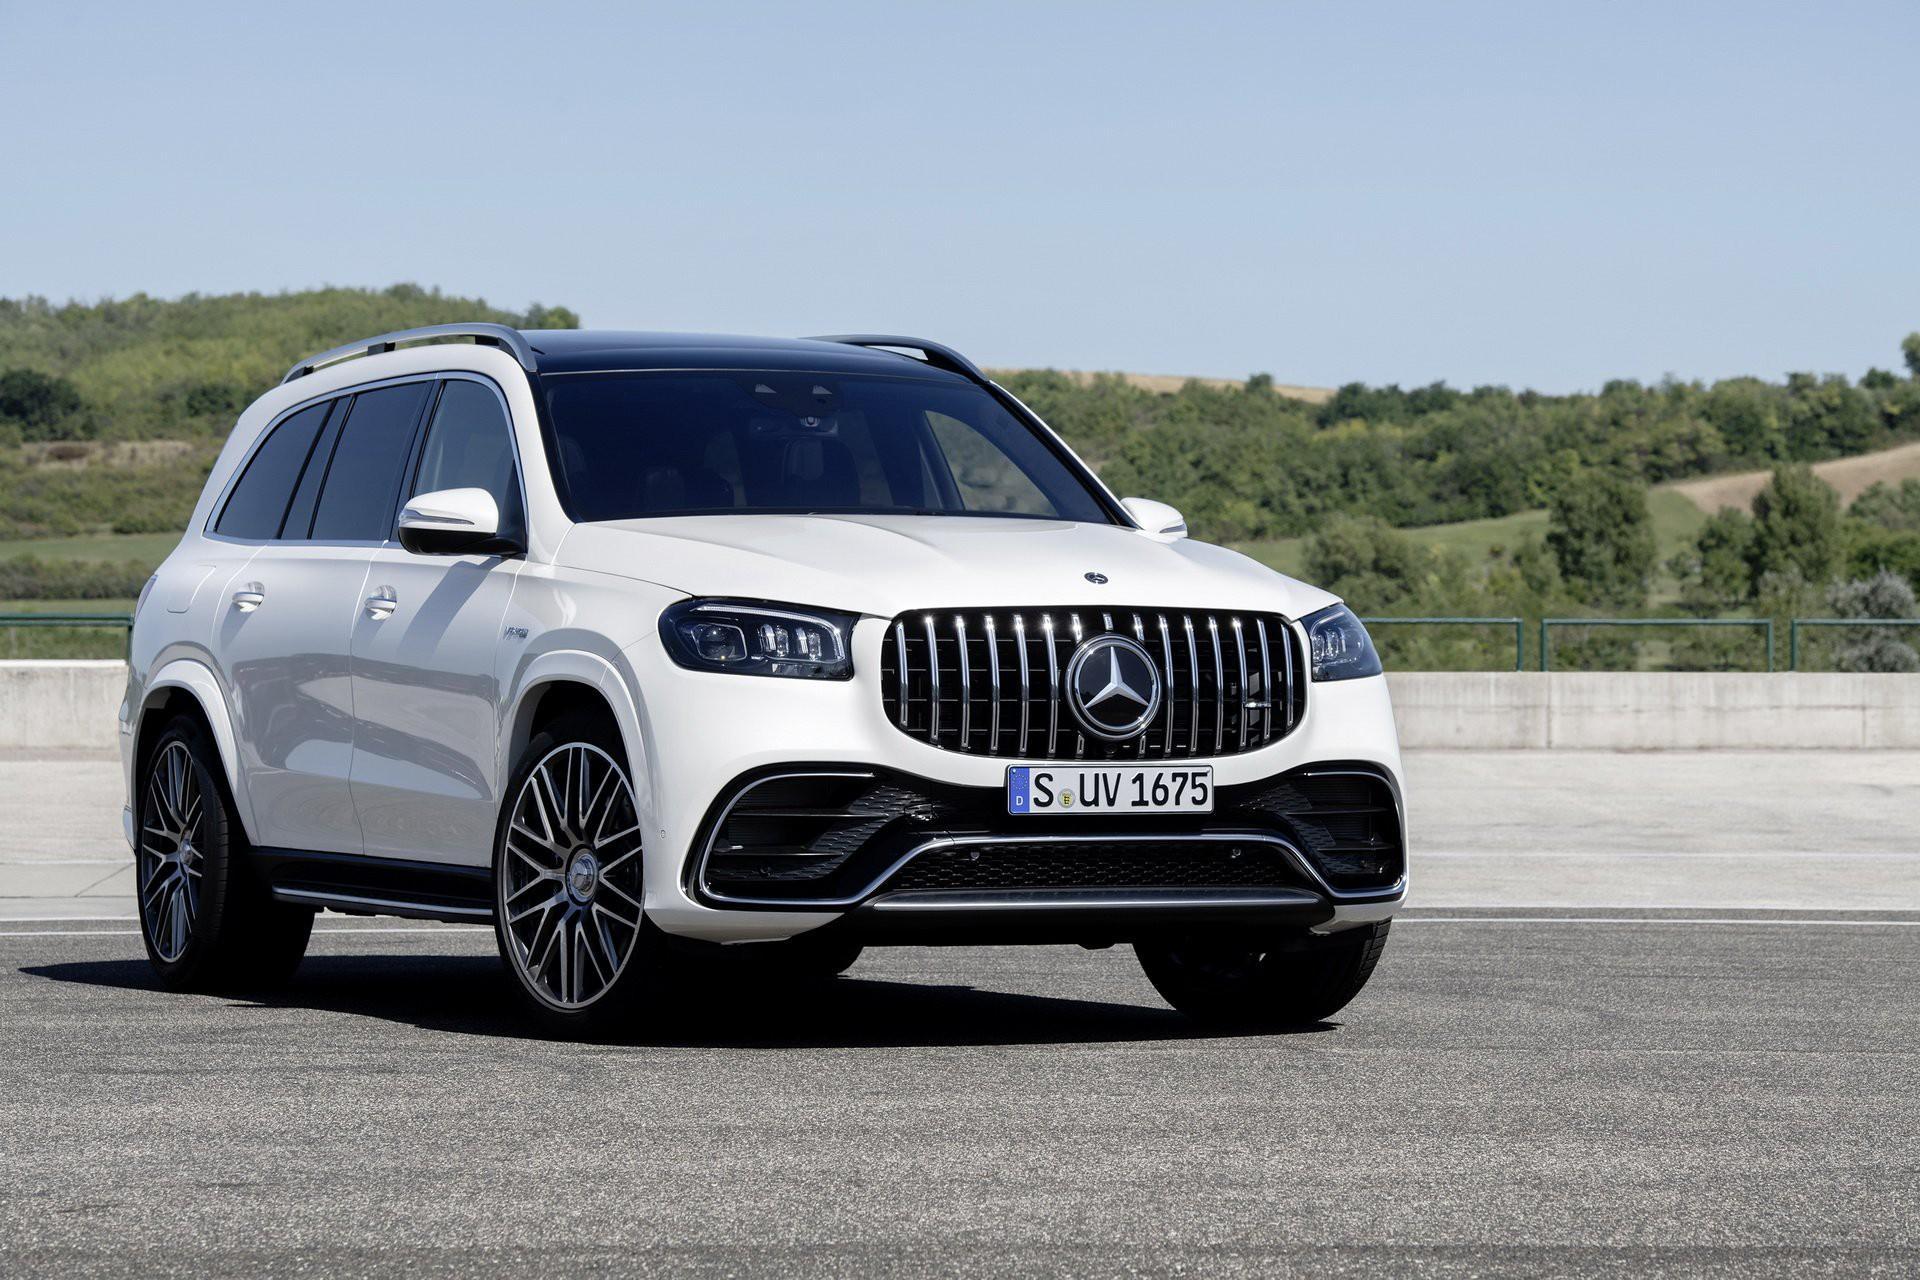 Khám phá Mercedes GLS 63 2020 vừa ra mắt Ảnh 8